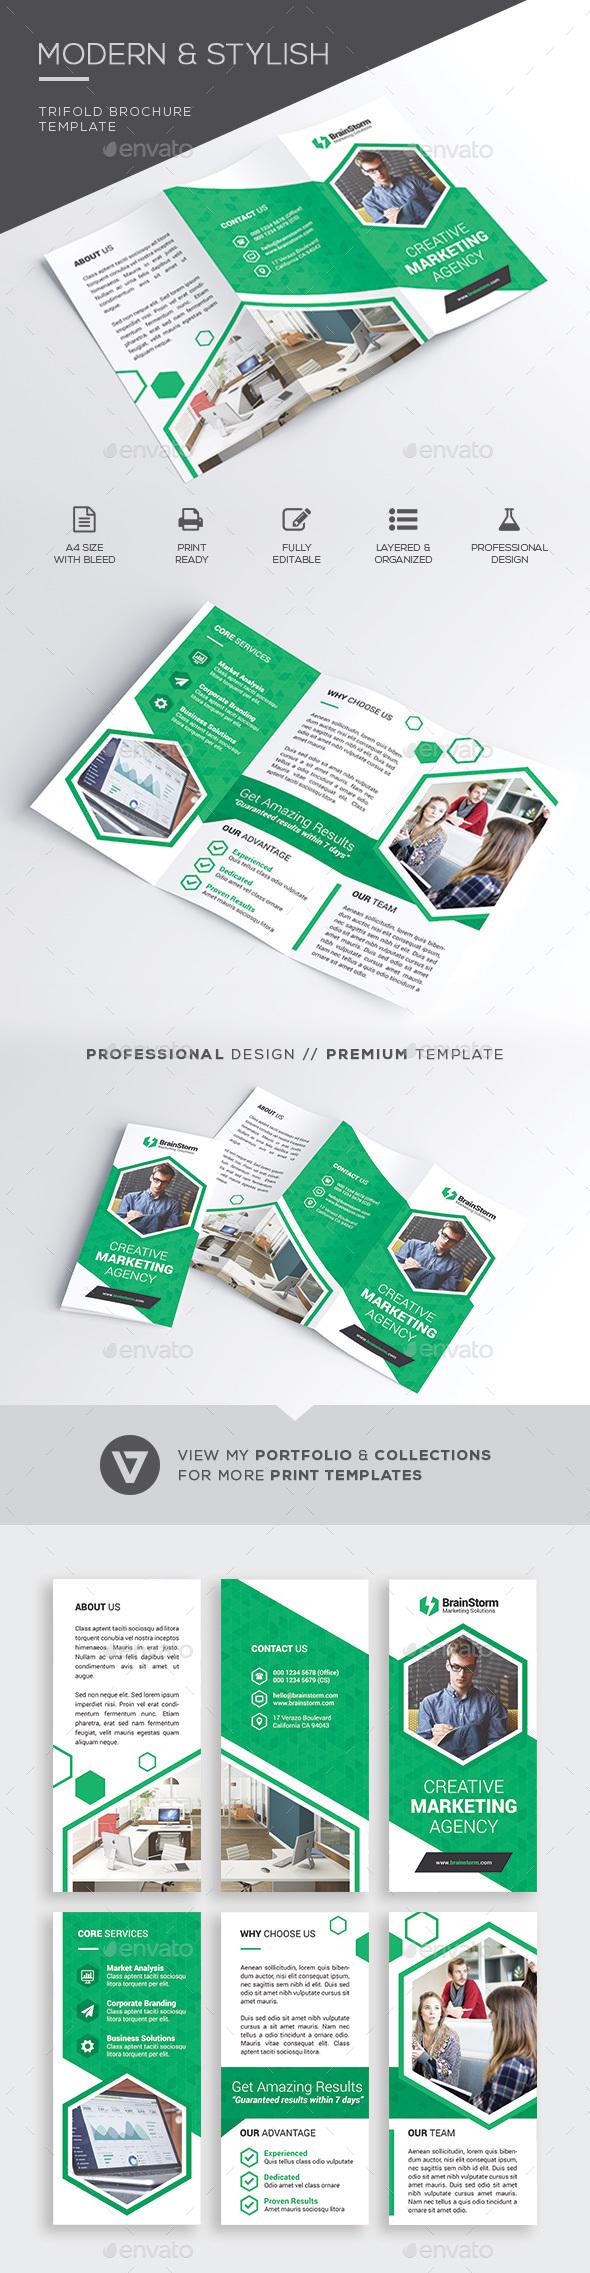 GraphicRiver Trifold Brochure 21025535